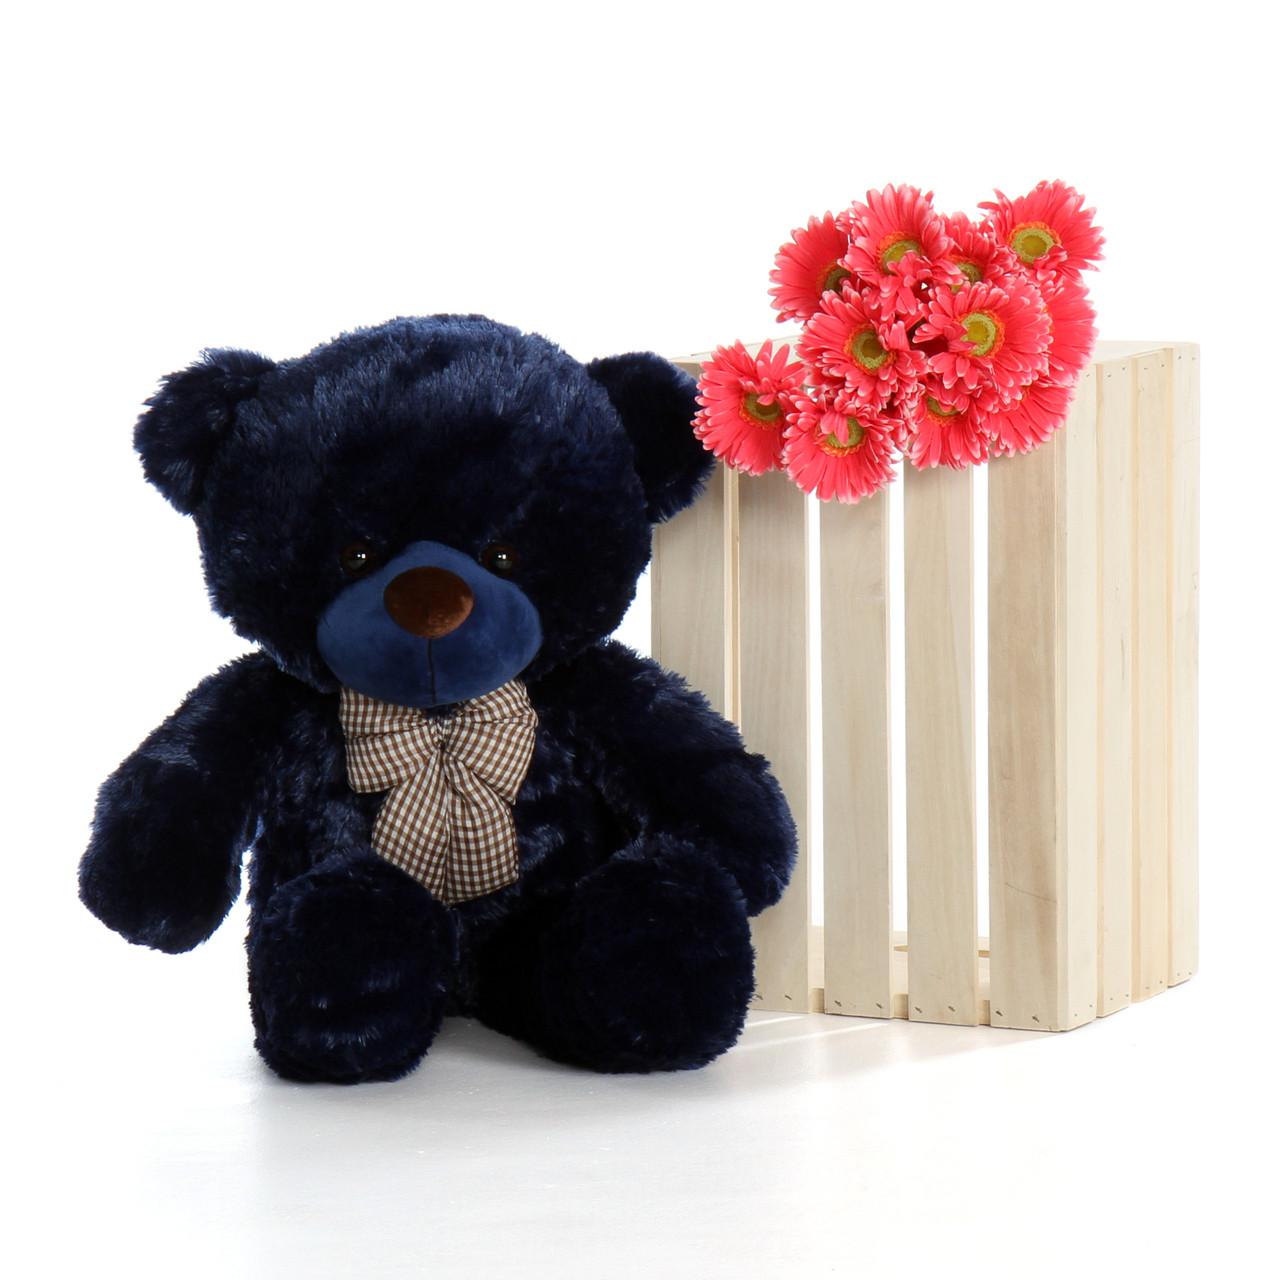 30in Royce Cuddles Navy Blue Teddy Bear